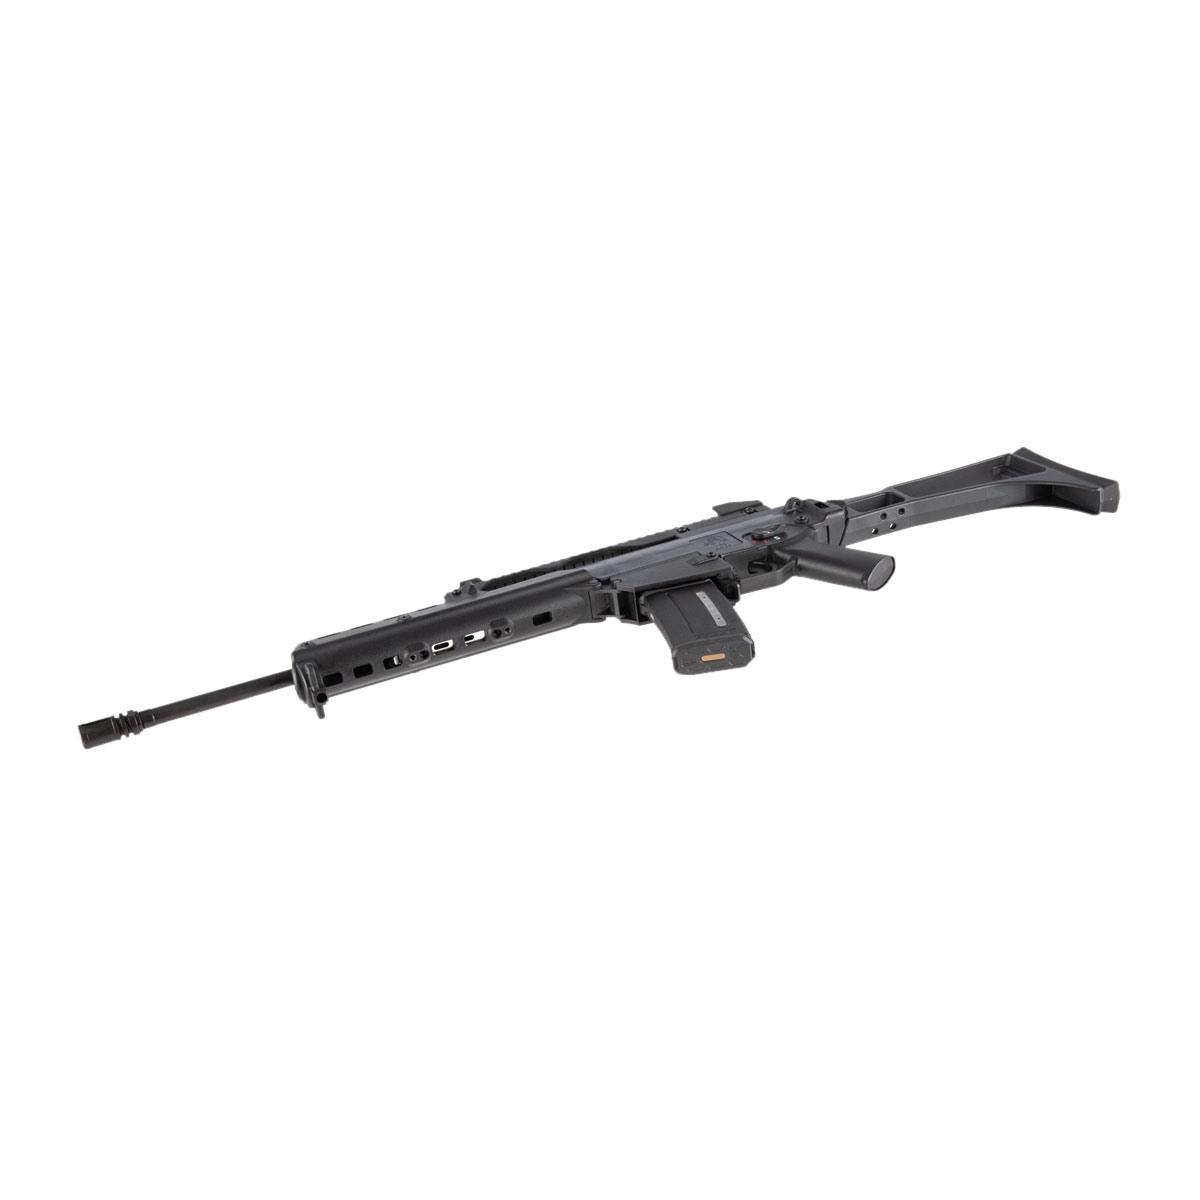 Tommy Built Tactical Llc T36ker 5 56 Rifle